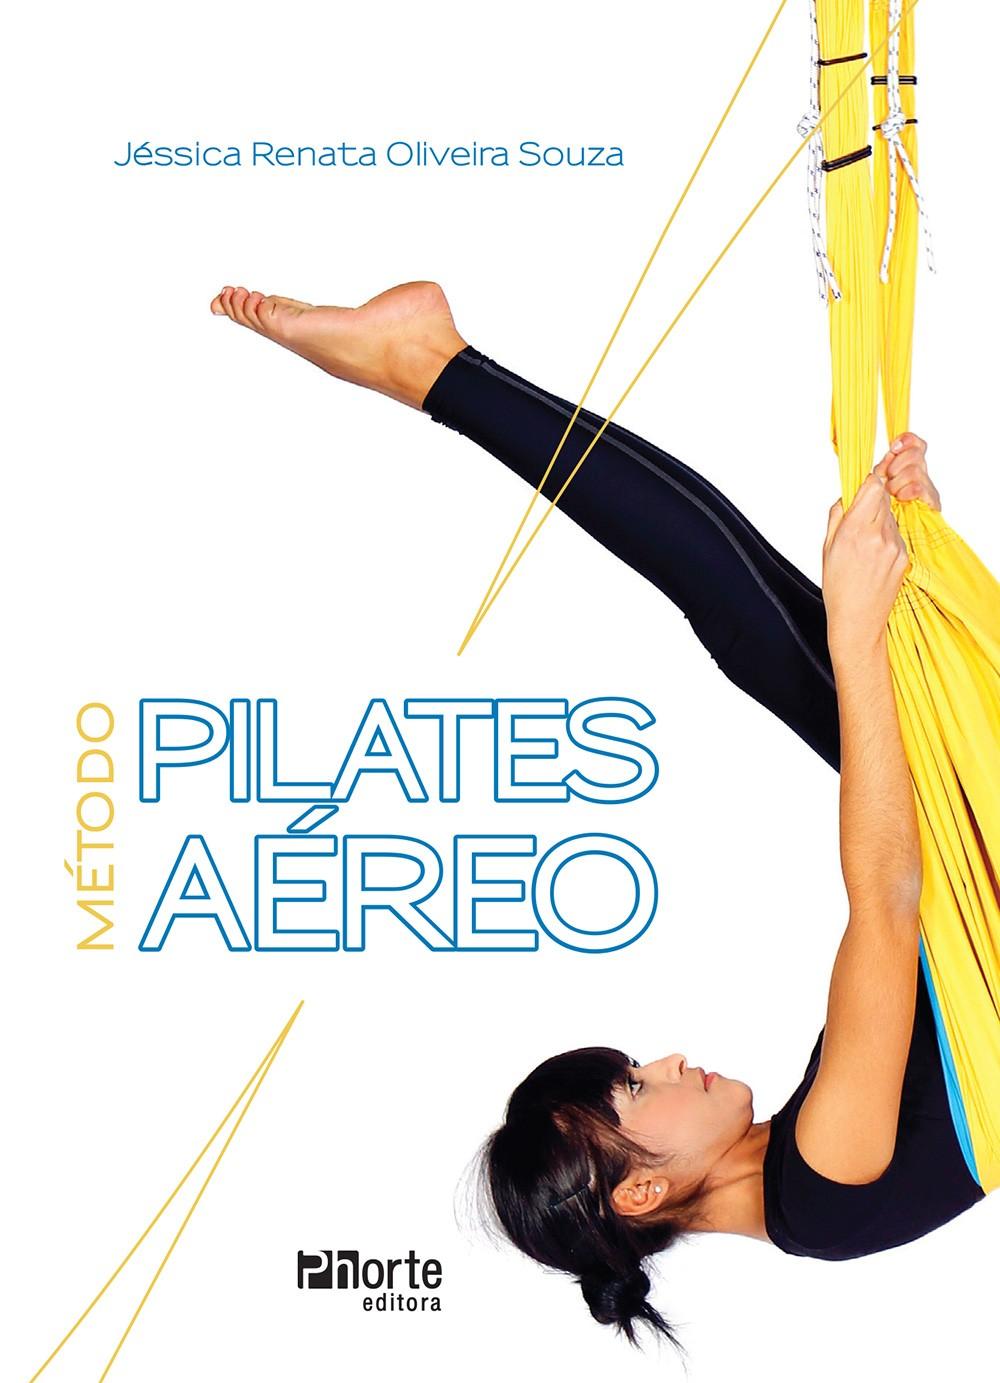 Método pilates aéreo (Jéssica Renata Oliveira Souza)  - Phorte Editora